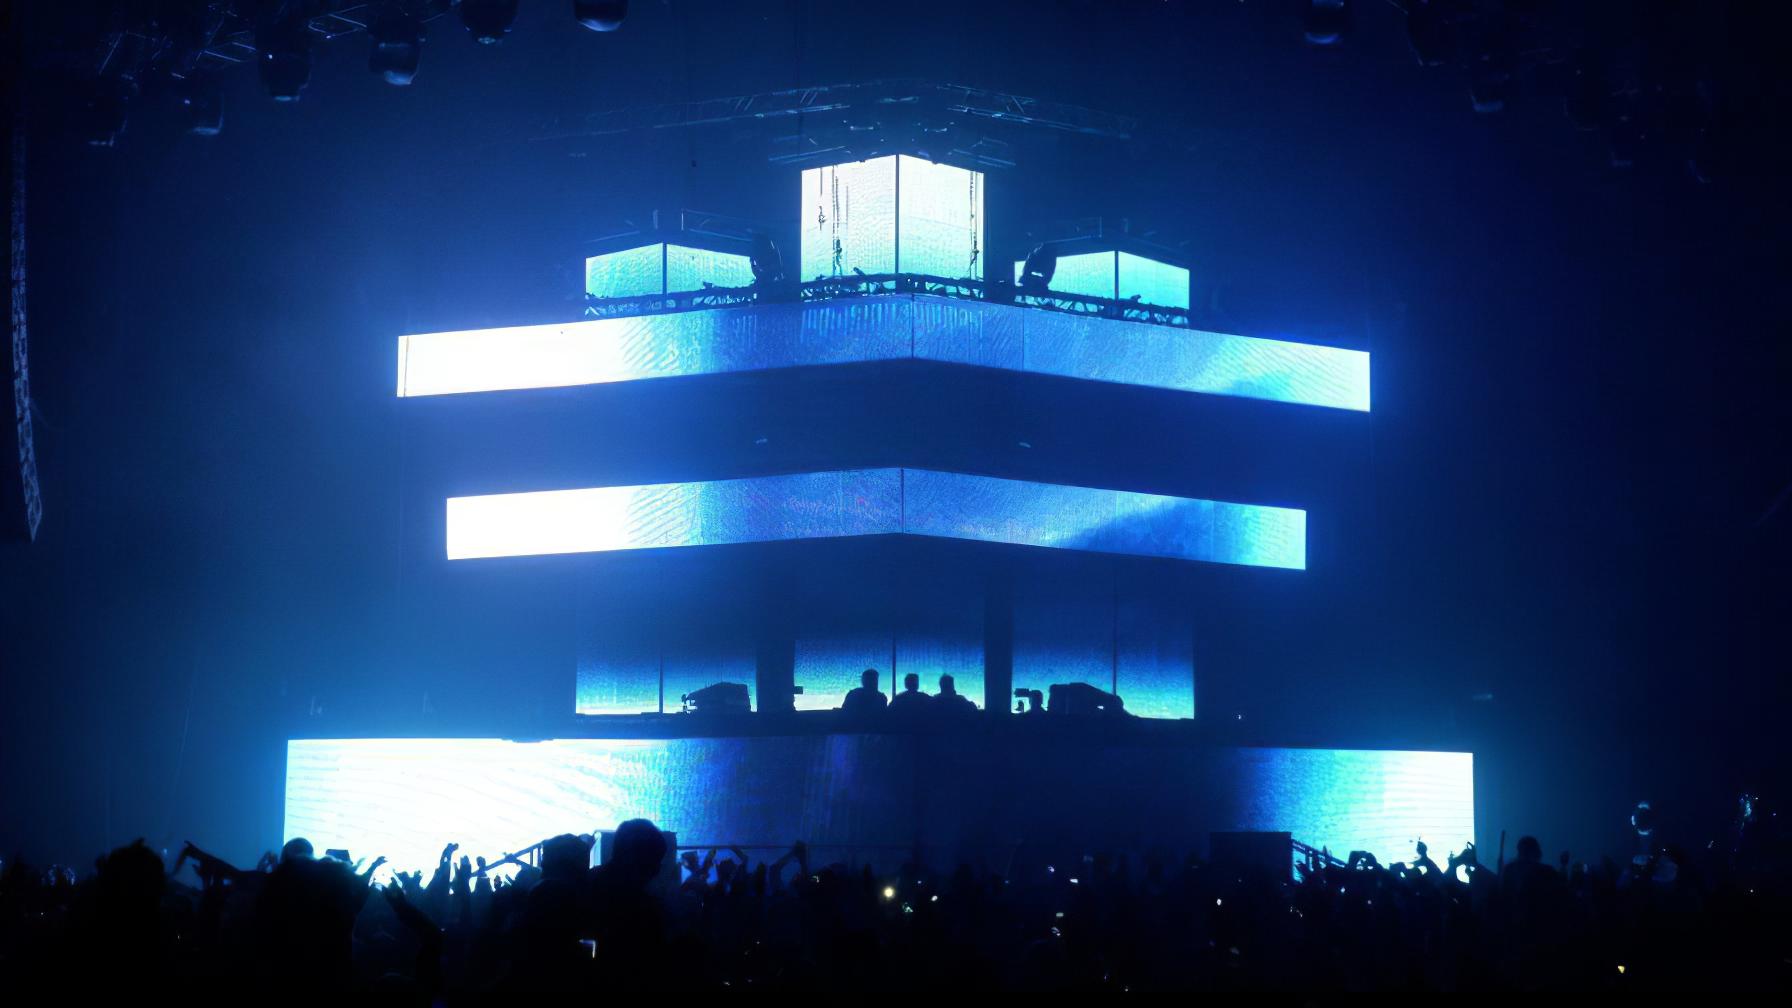 immersive-ltd_pendulum_tour-visuals_immersion-live-concert_04-896×504-1-gigapixel